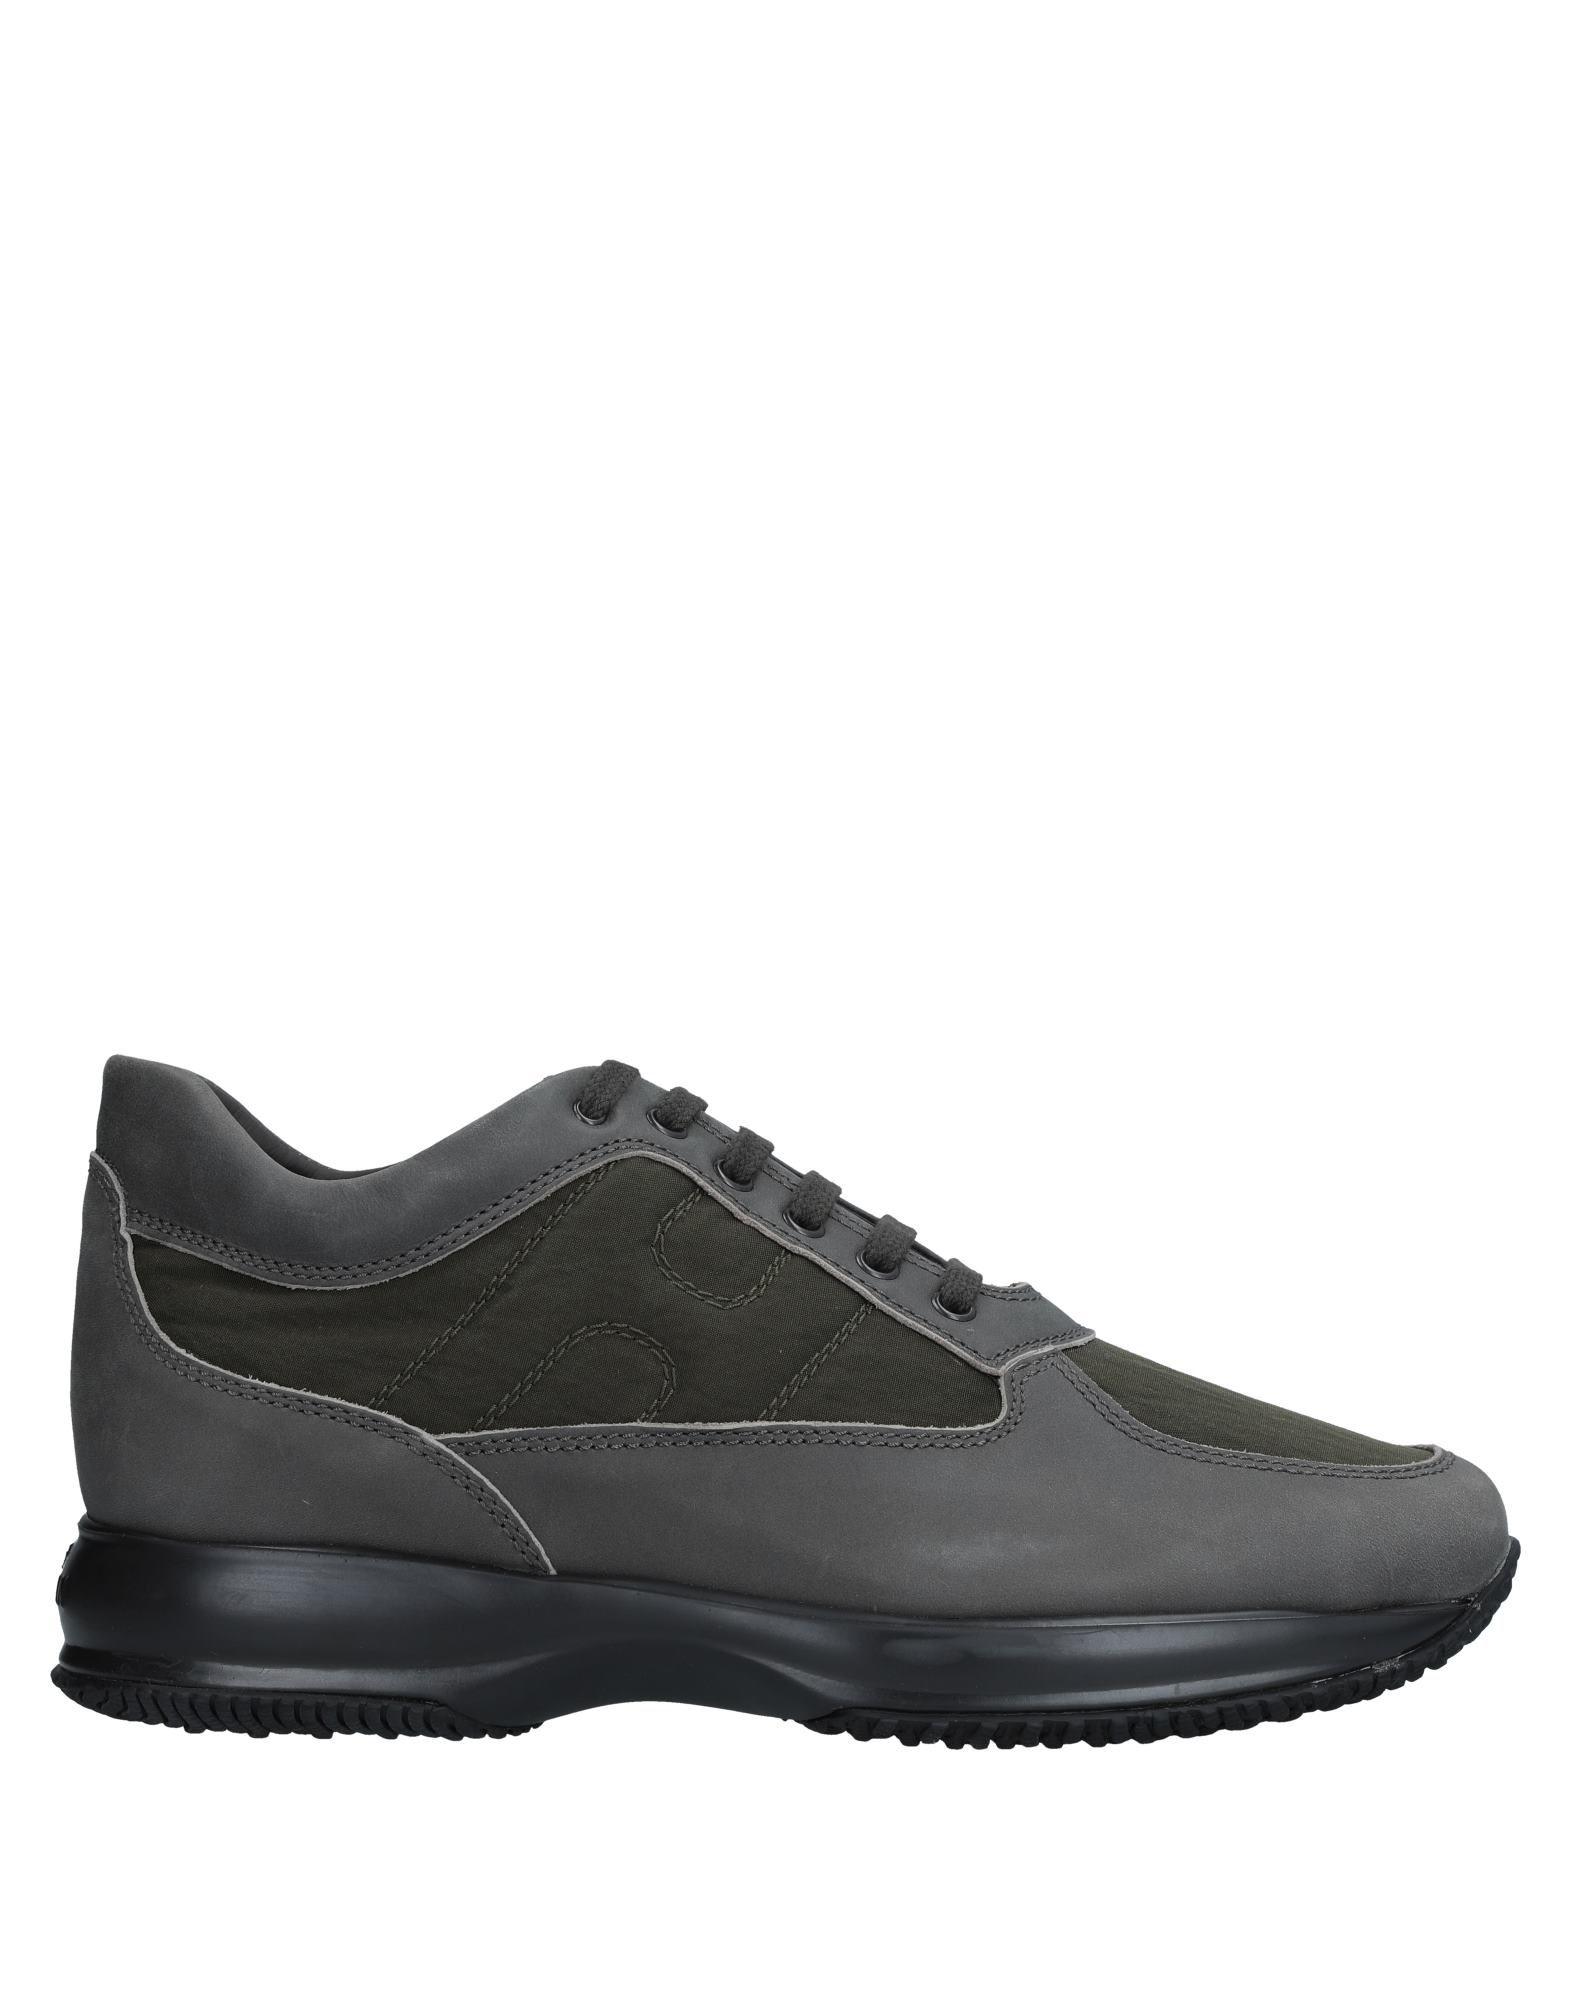 Moda Sneakers Hogan Uomo - 11541540NV